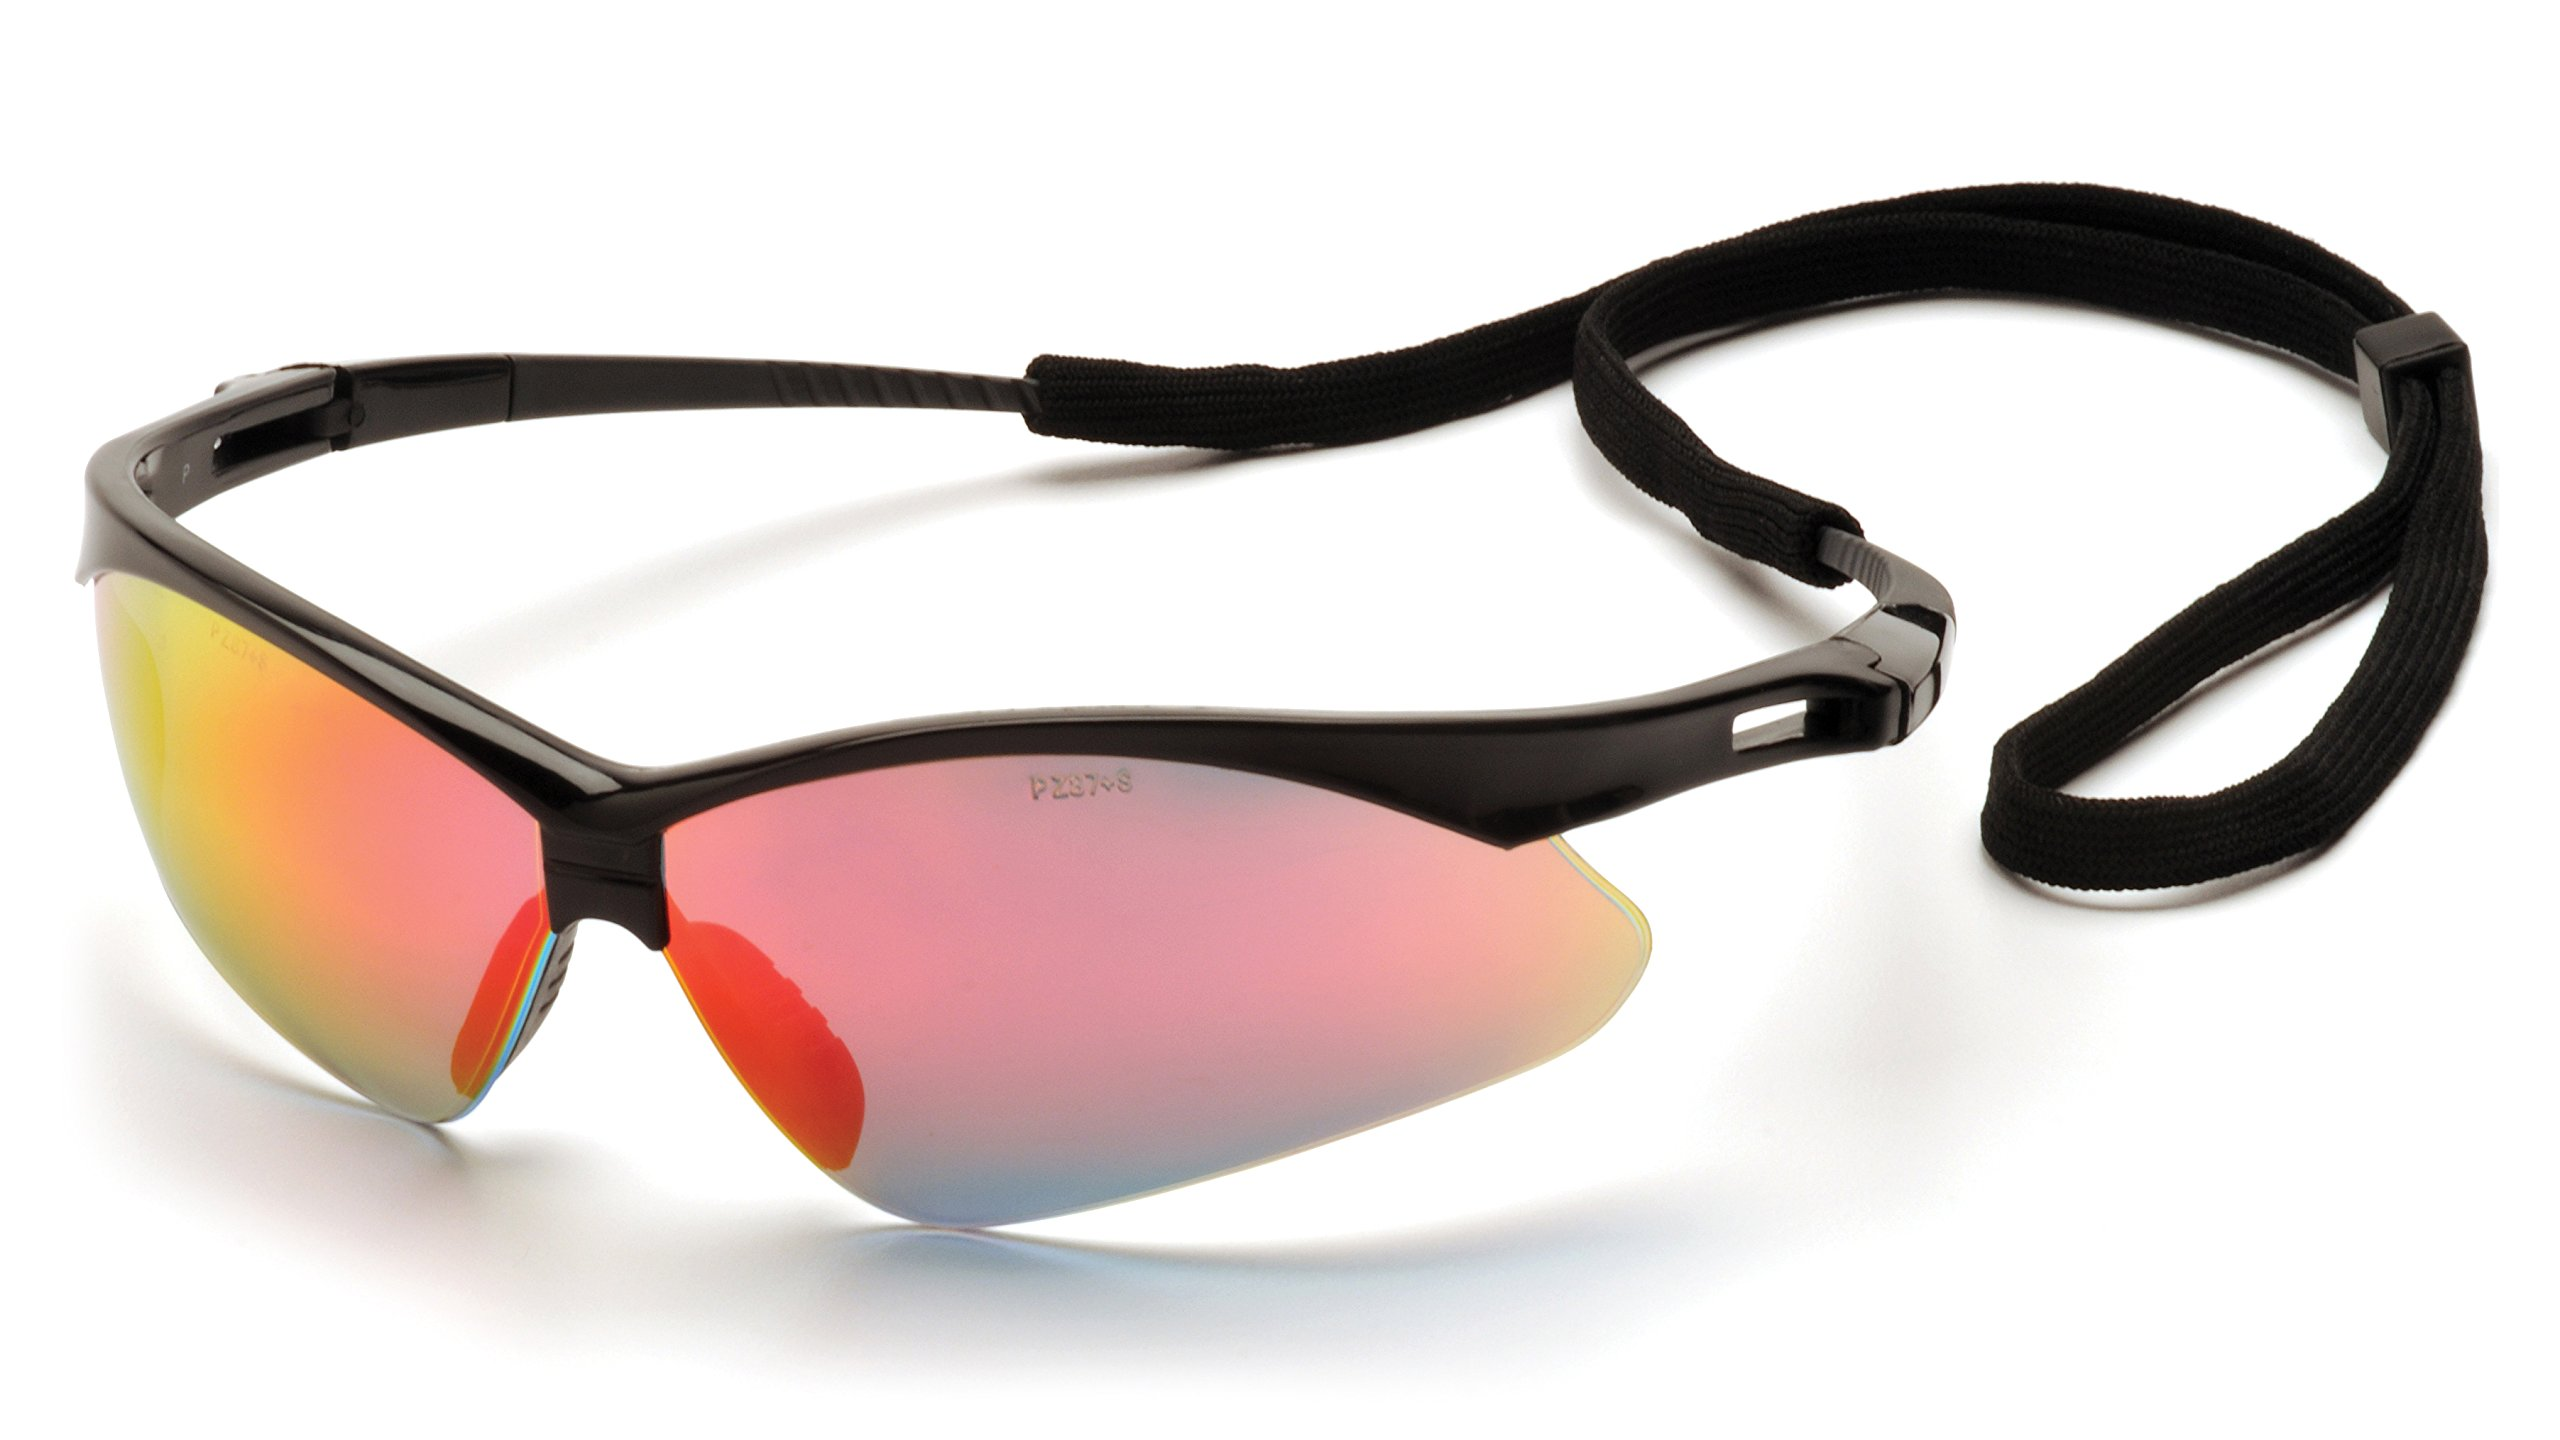 Pyramex Safety PMXTREME Eyewear, Black Frame with Cord, Ice Orange Lens